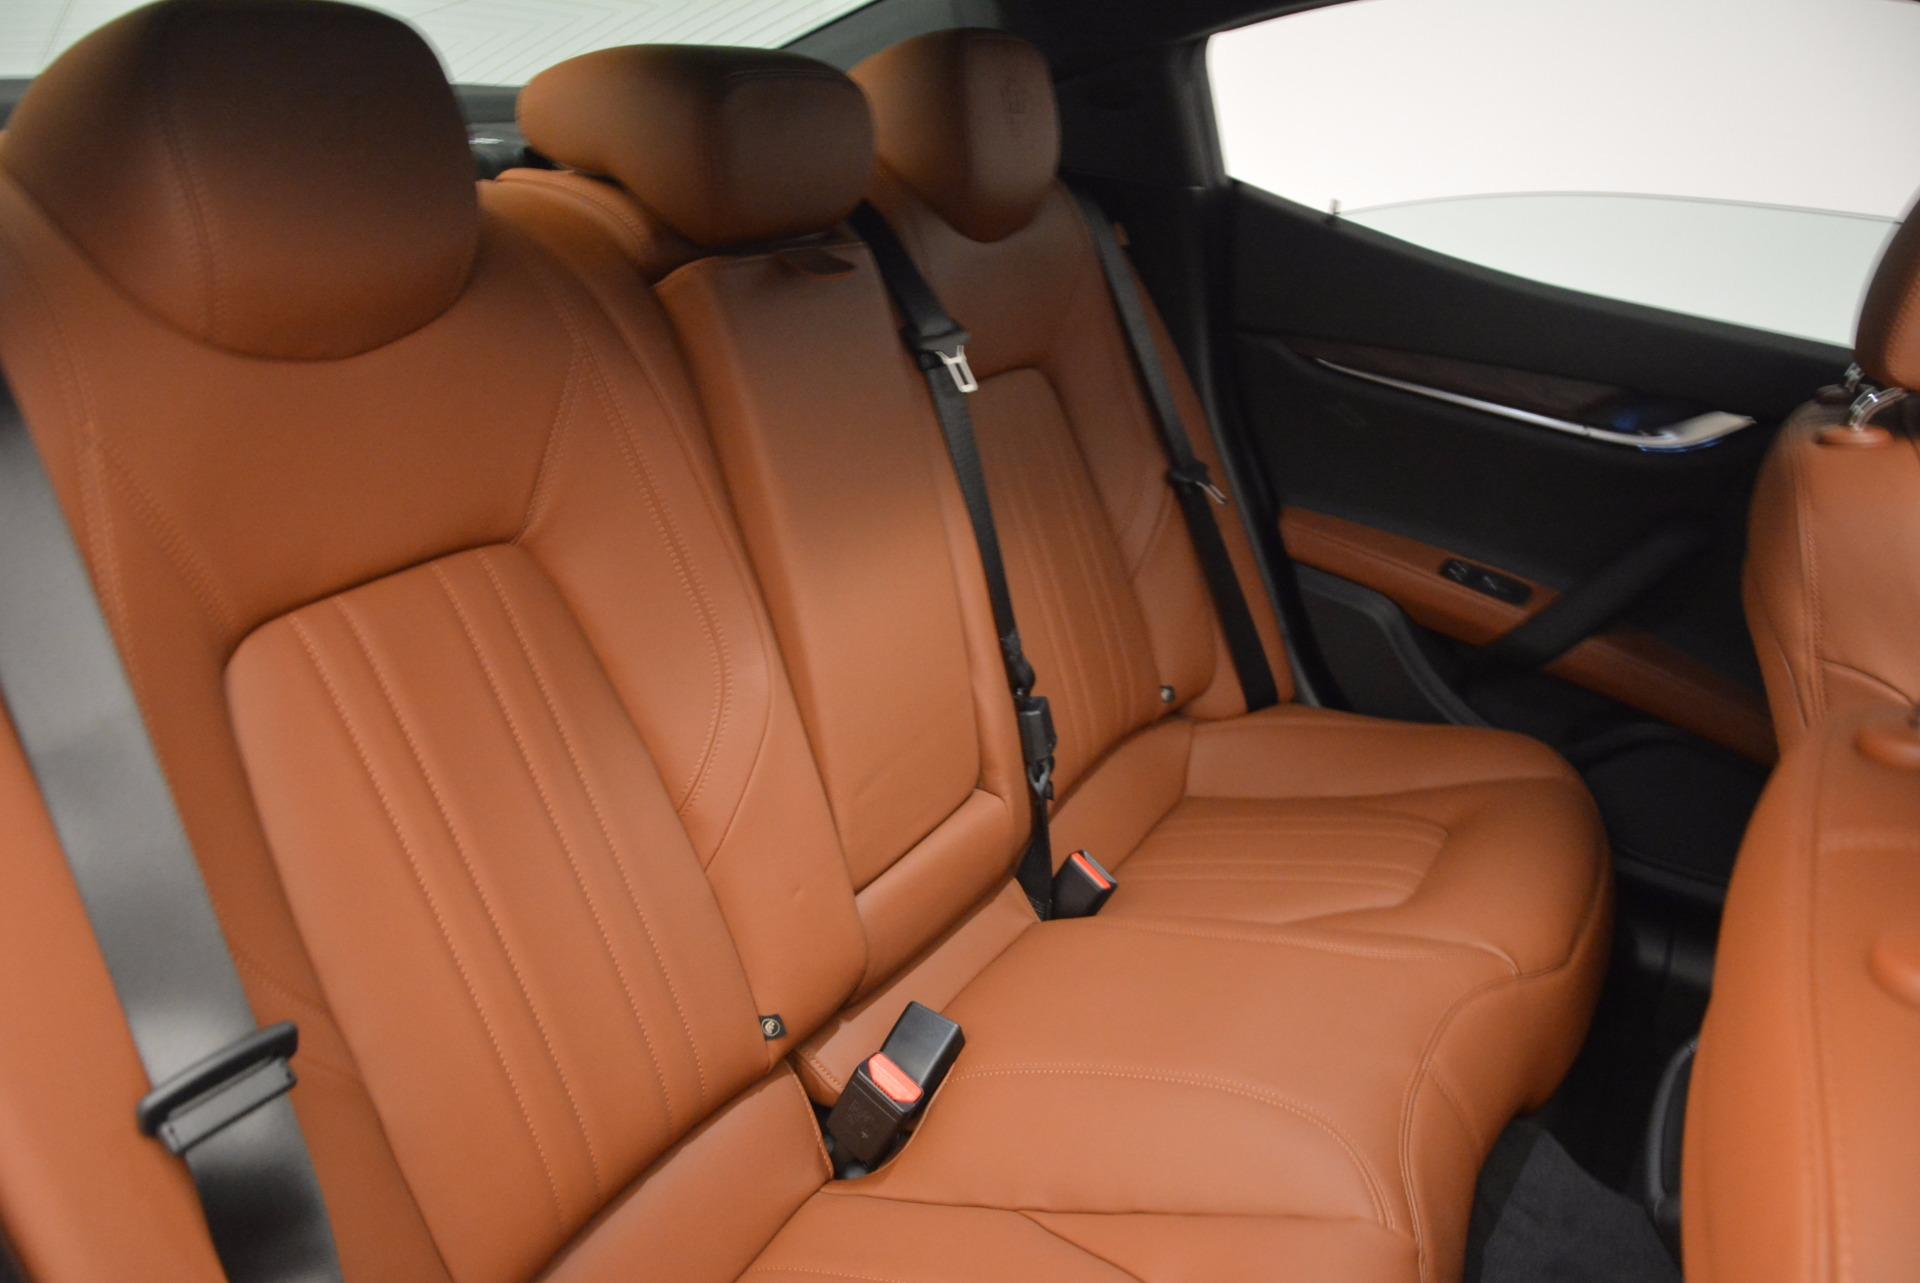 Used 2017 Maserati Ghibli S Q4 Ex-Loaner For Sale In Greenwich, CT 1165_p18